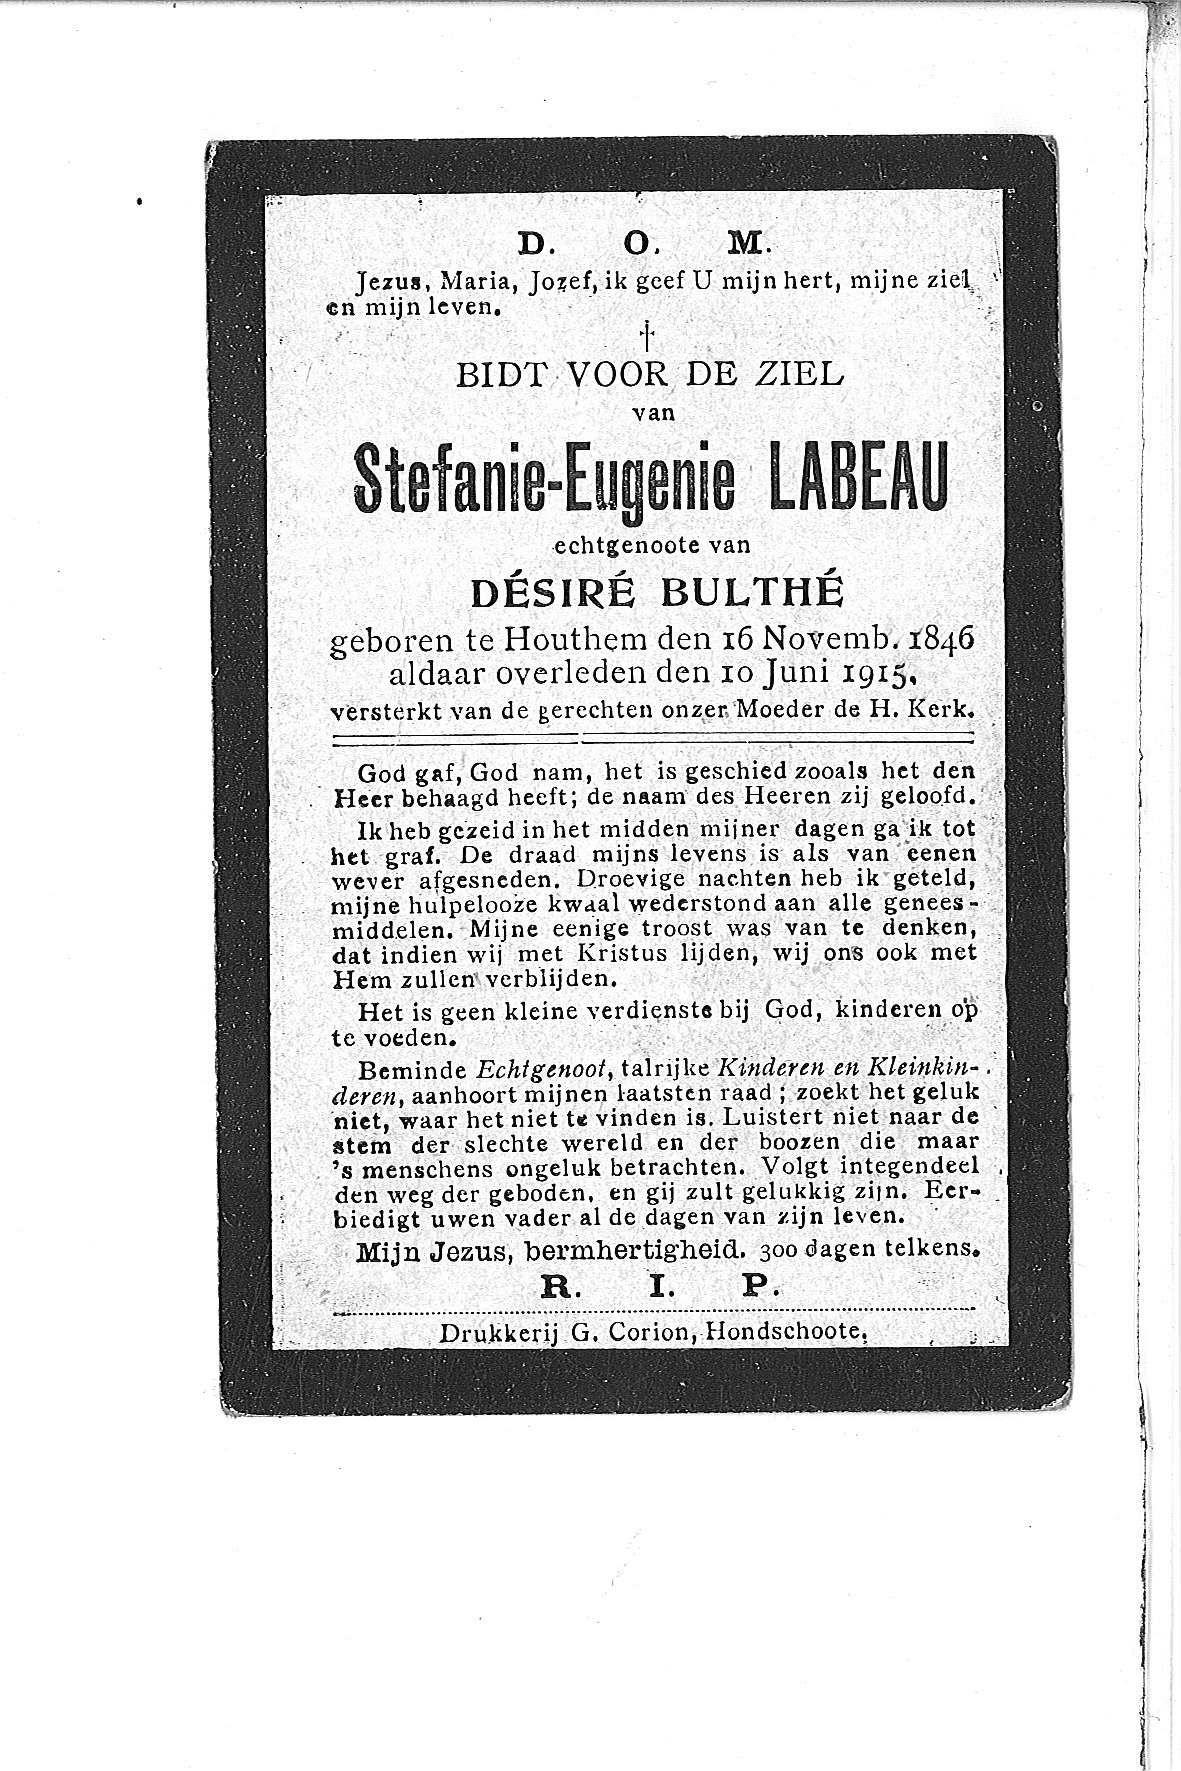 Stefanie-Eugenie(1915)20110119162717_00013.jpg